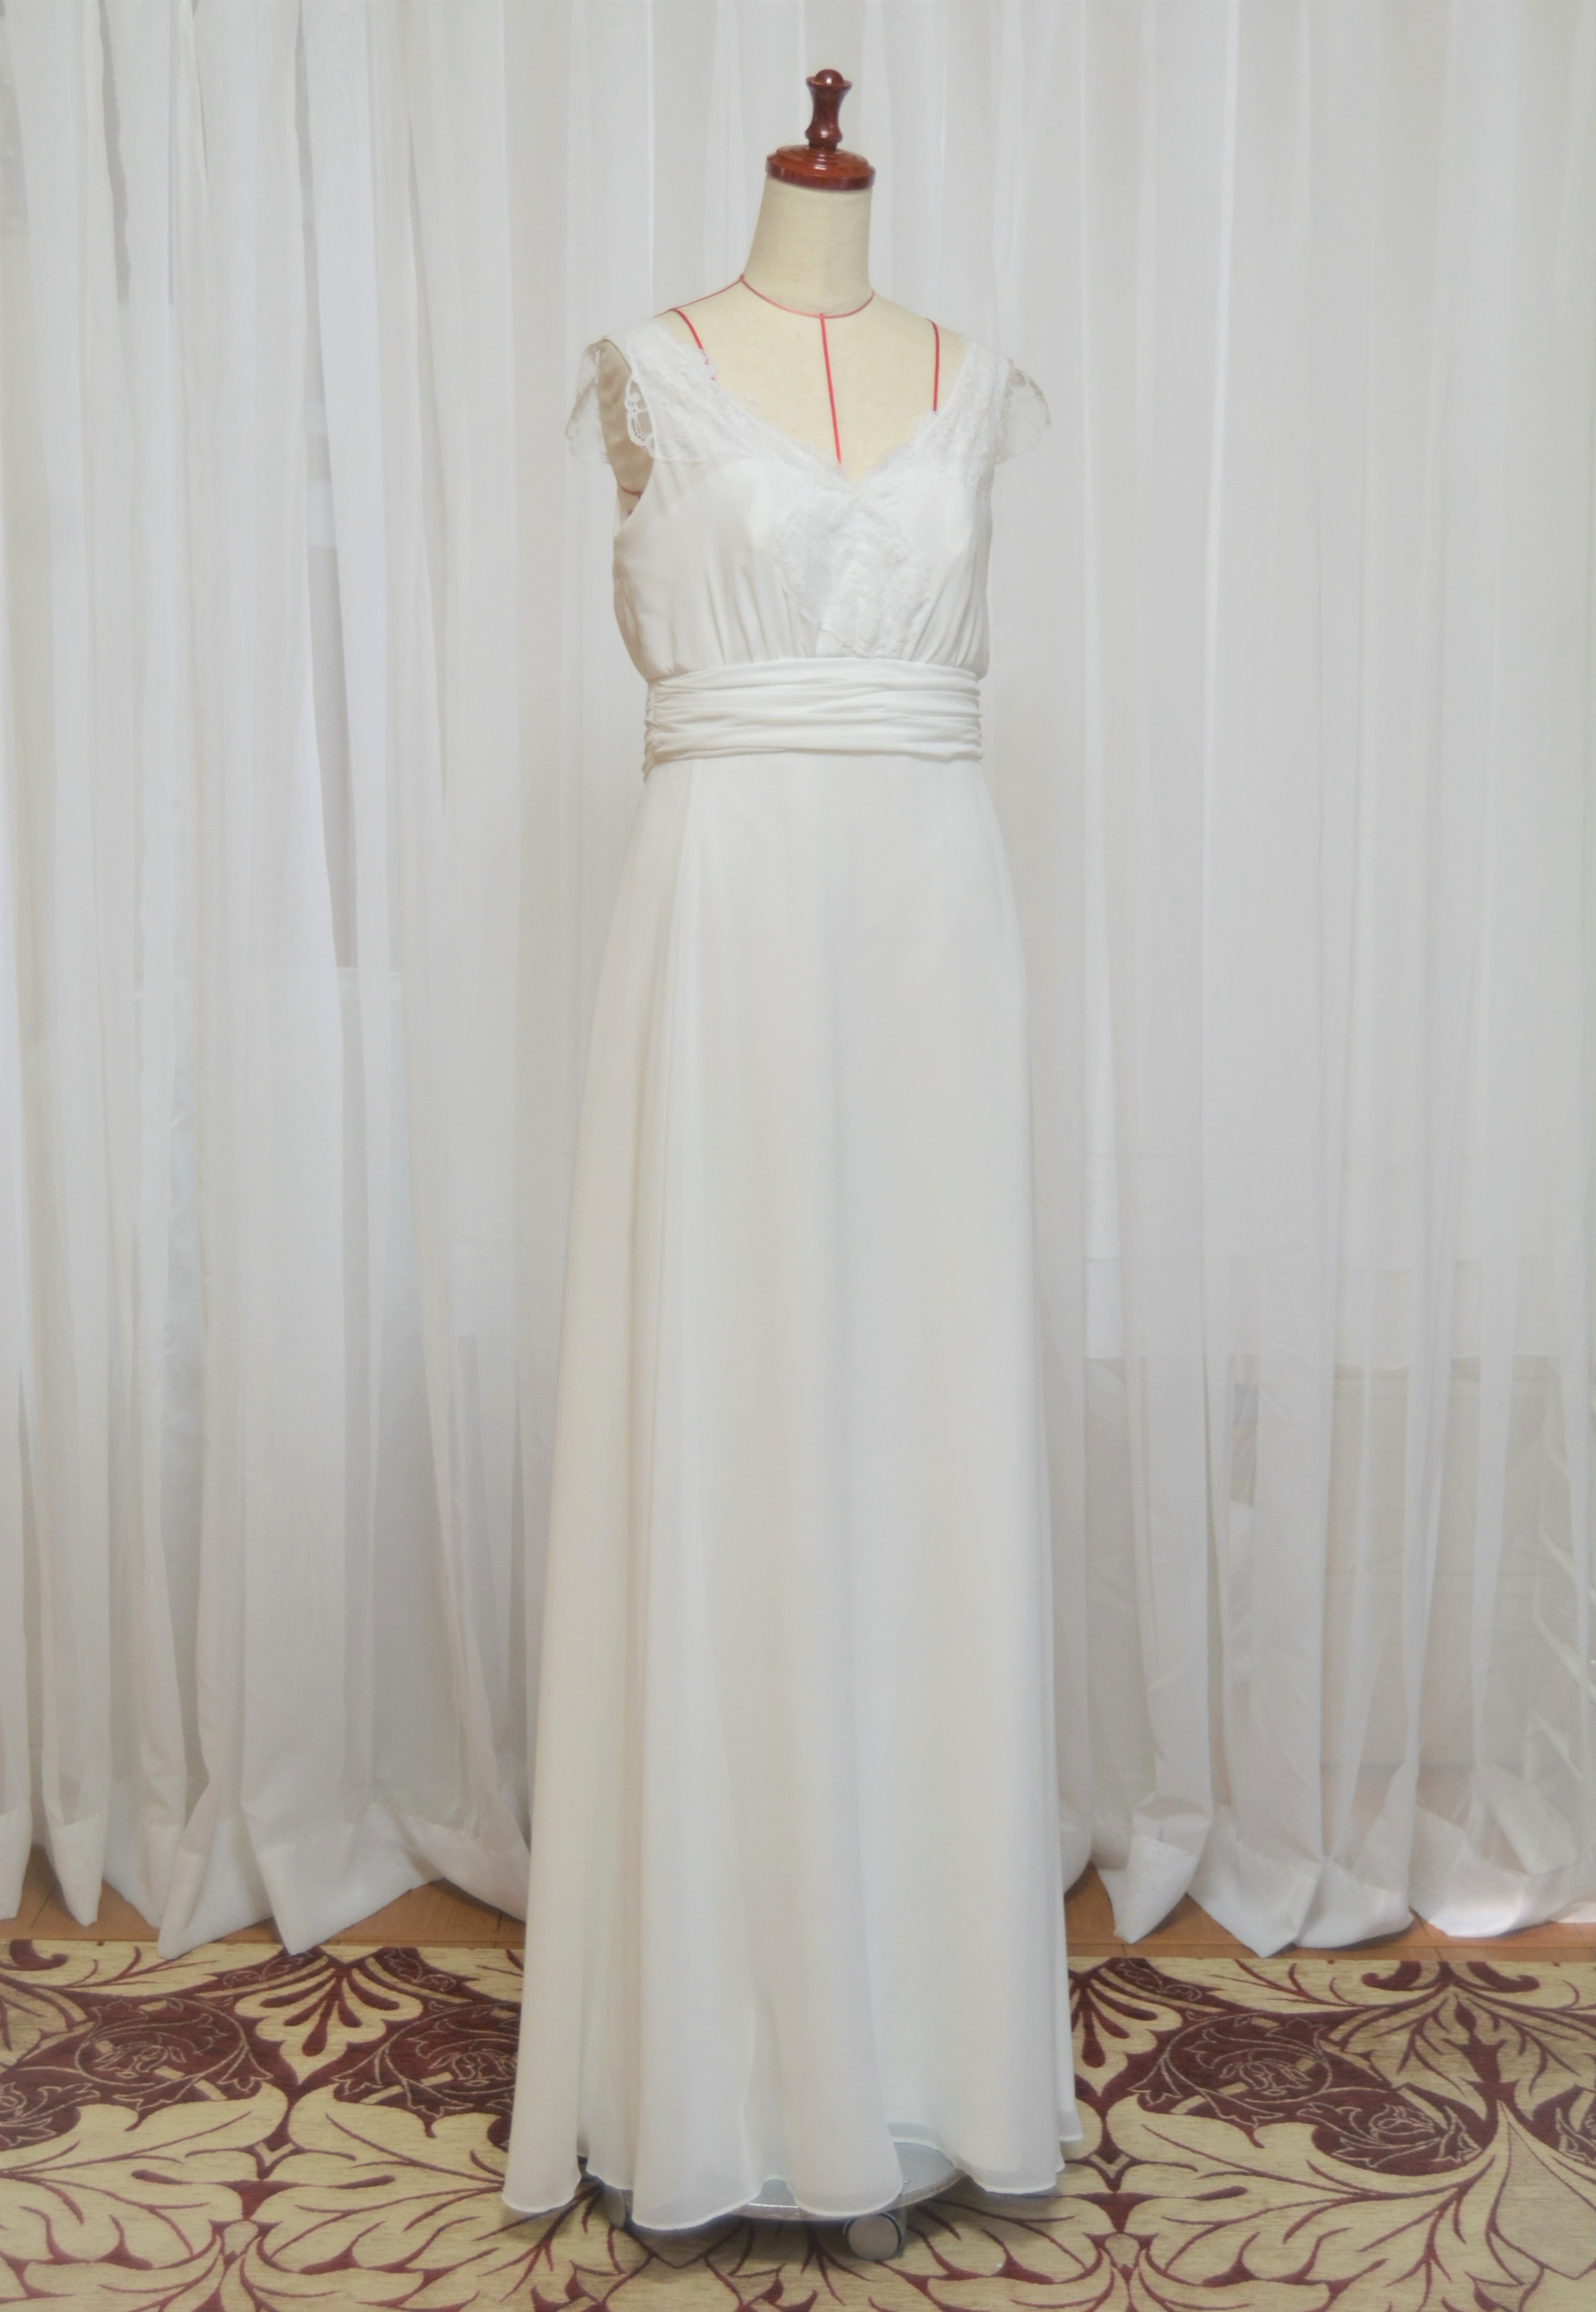 hanayomesalon スレンダーライン ウエディングドレス